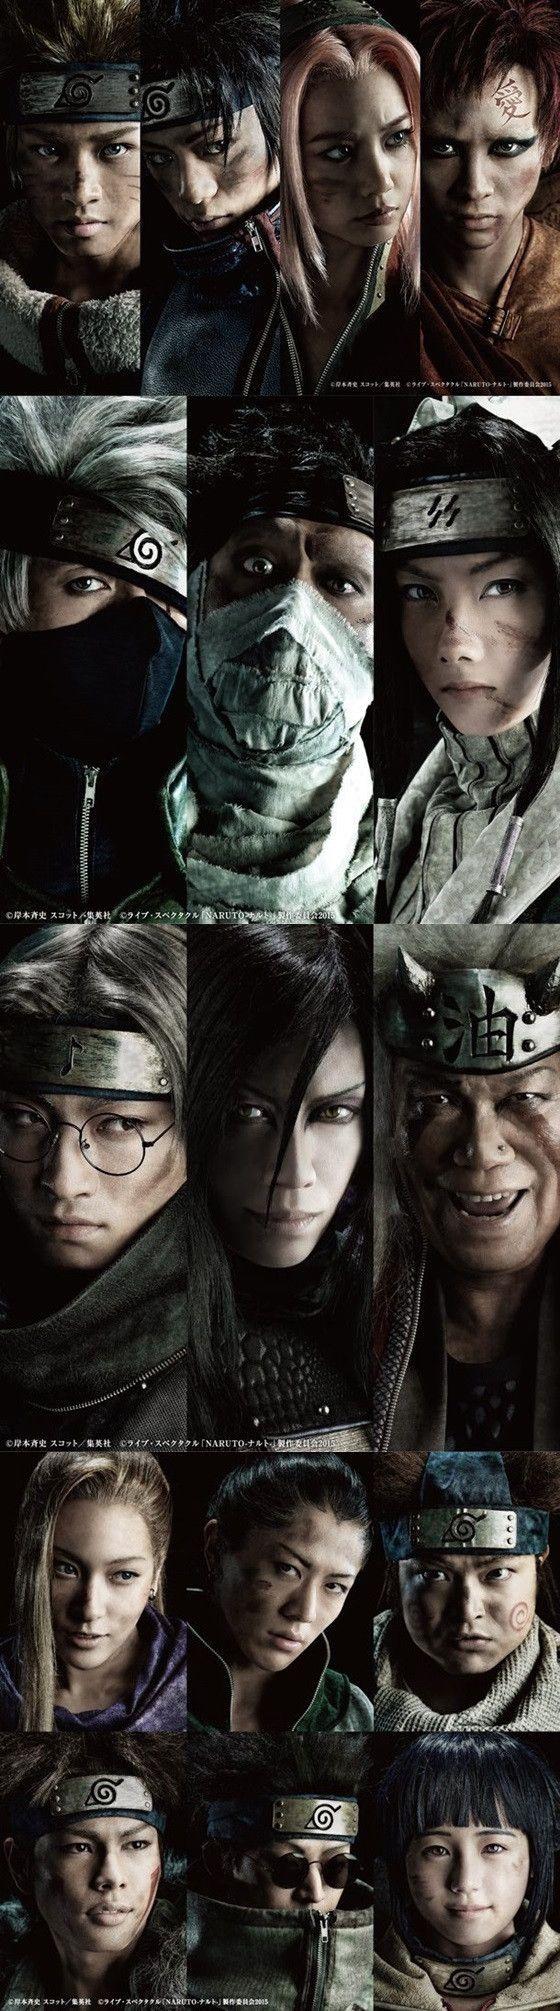 Live Spectacle Naruto, the upcoming stage play adaptation of Masashi Kishimoto's manga (2015). Cast visuals.